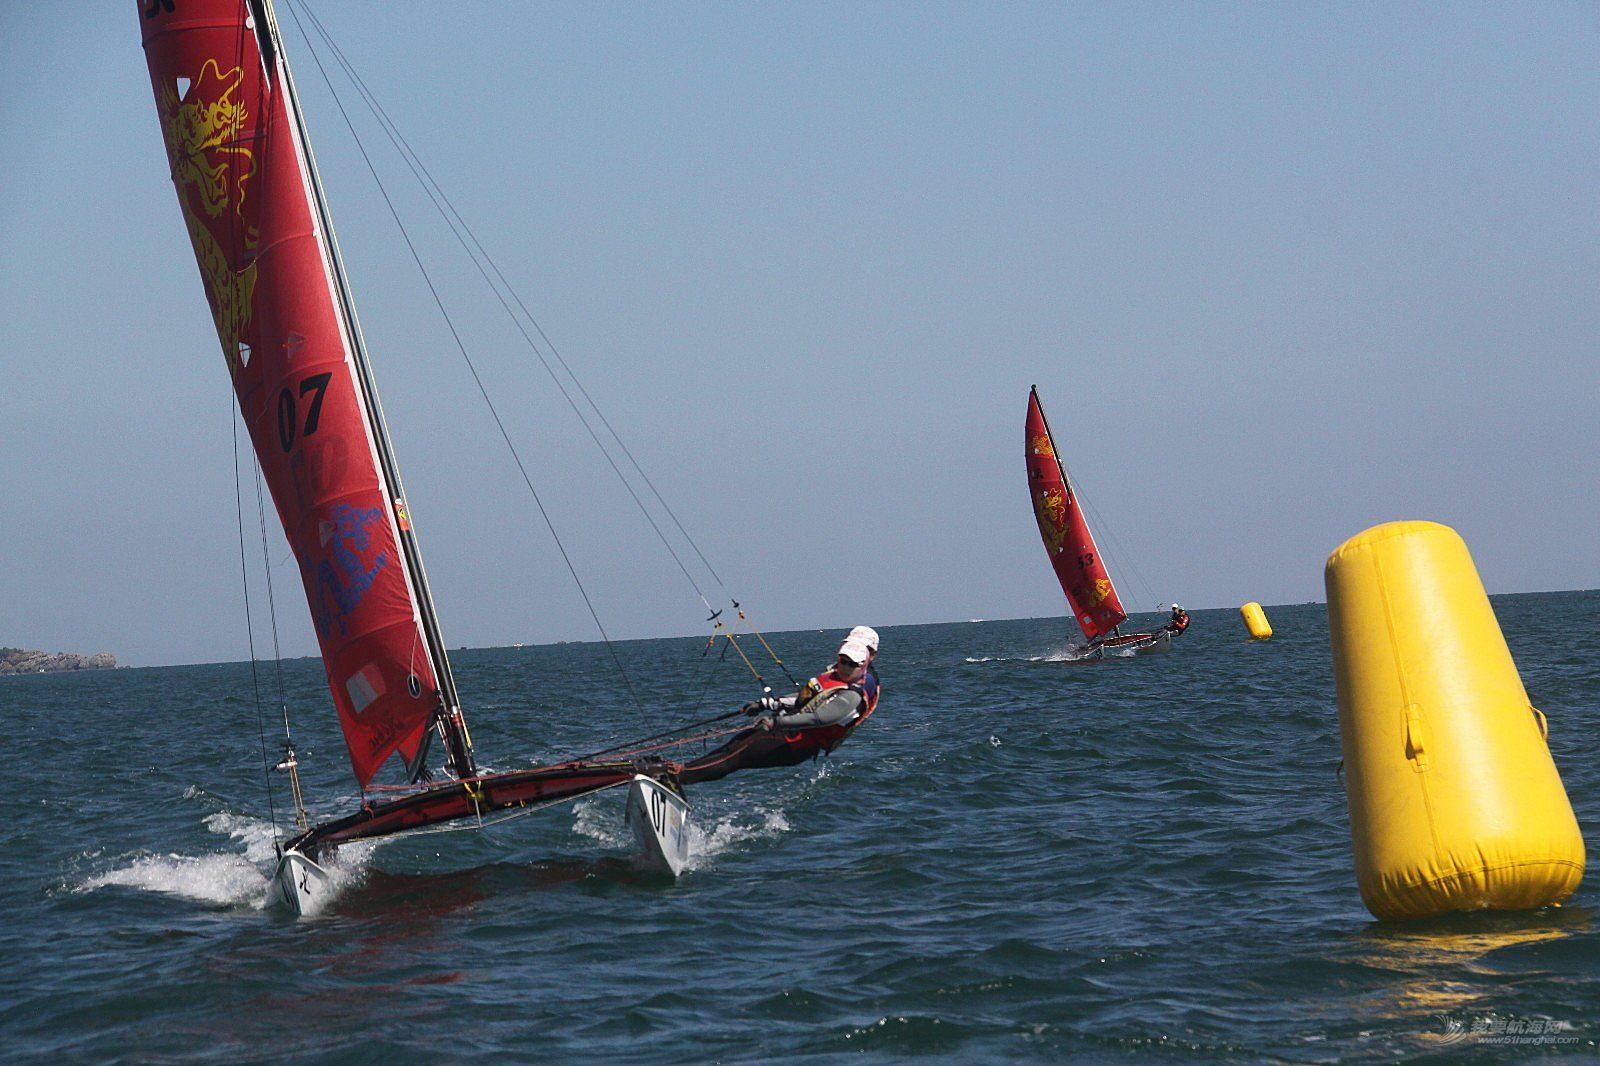 HOBIE国际帆船邀请赛双人舞篇